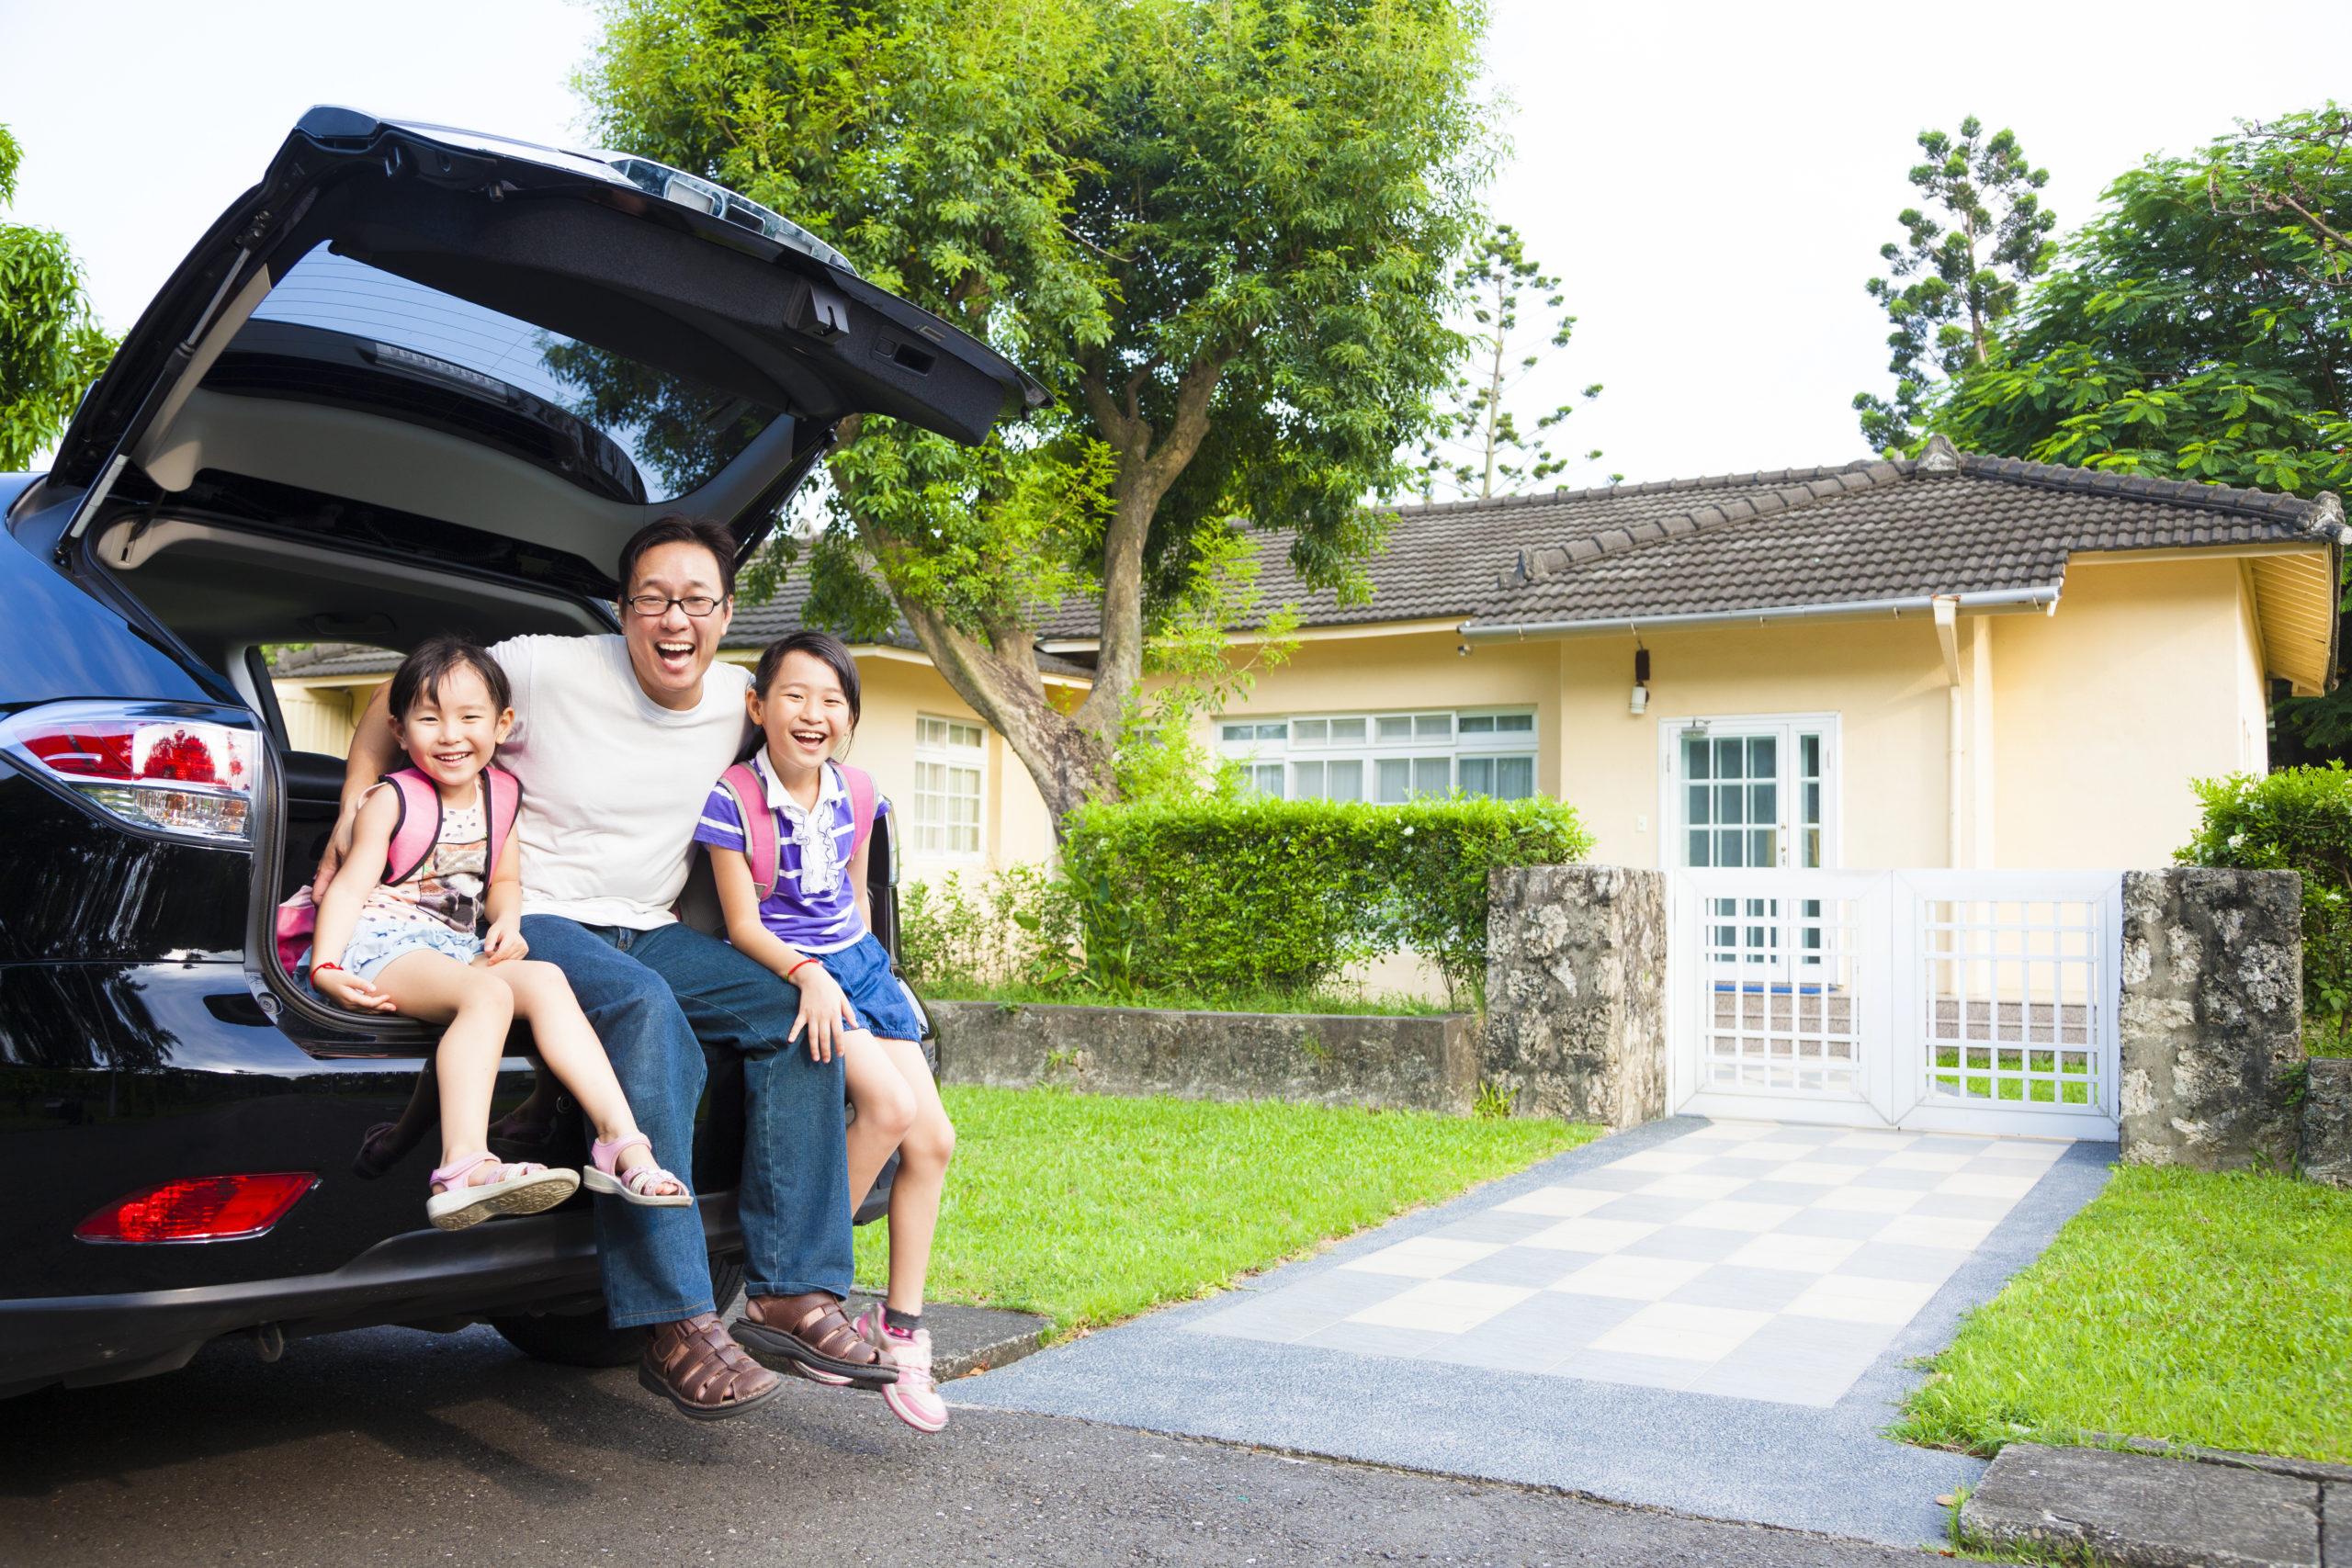 family cars